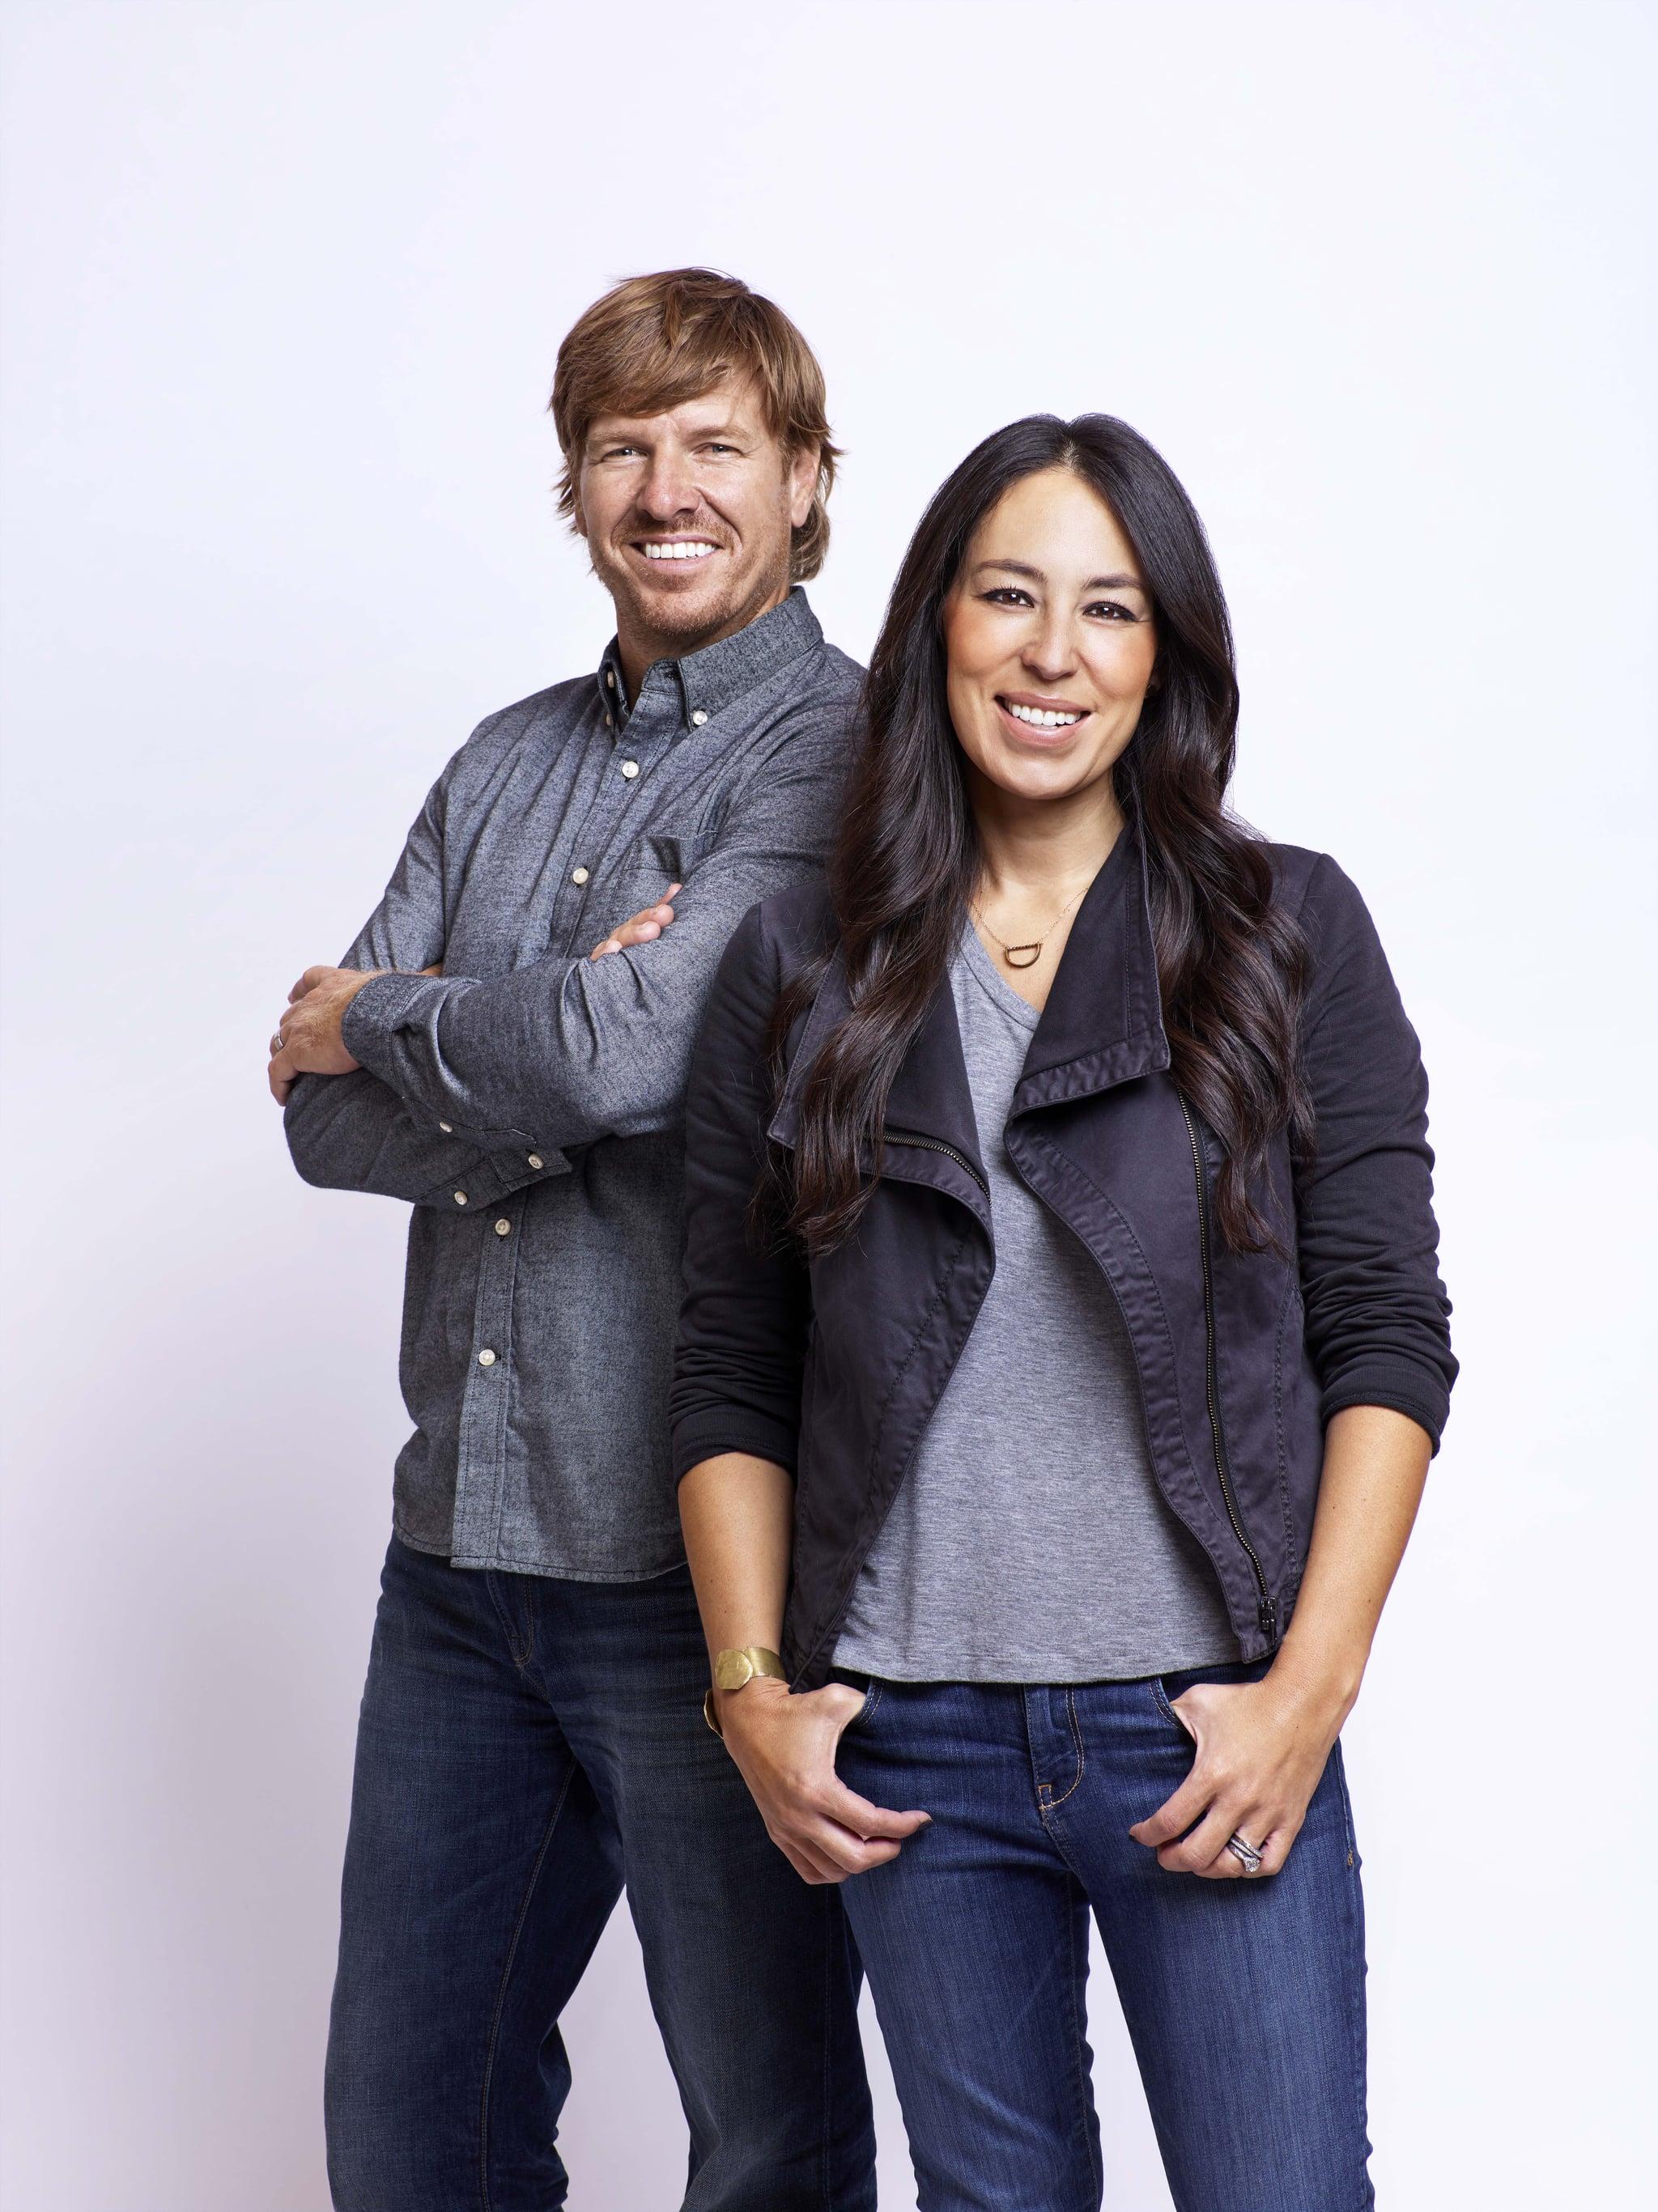 Chip And Joanna Gaines In Entrepreneur Magazine Popsugar